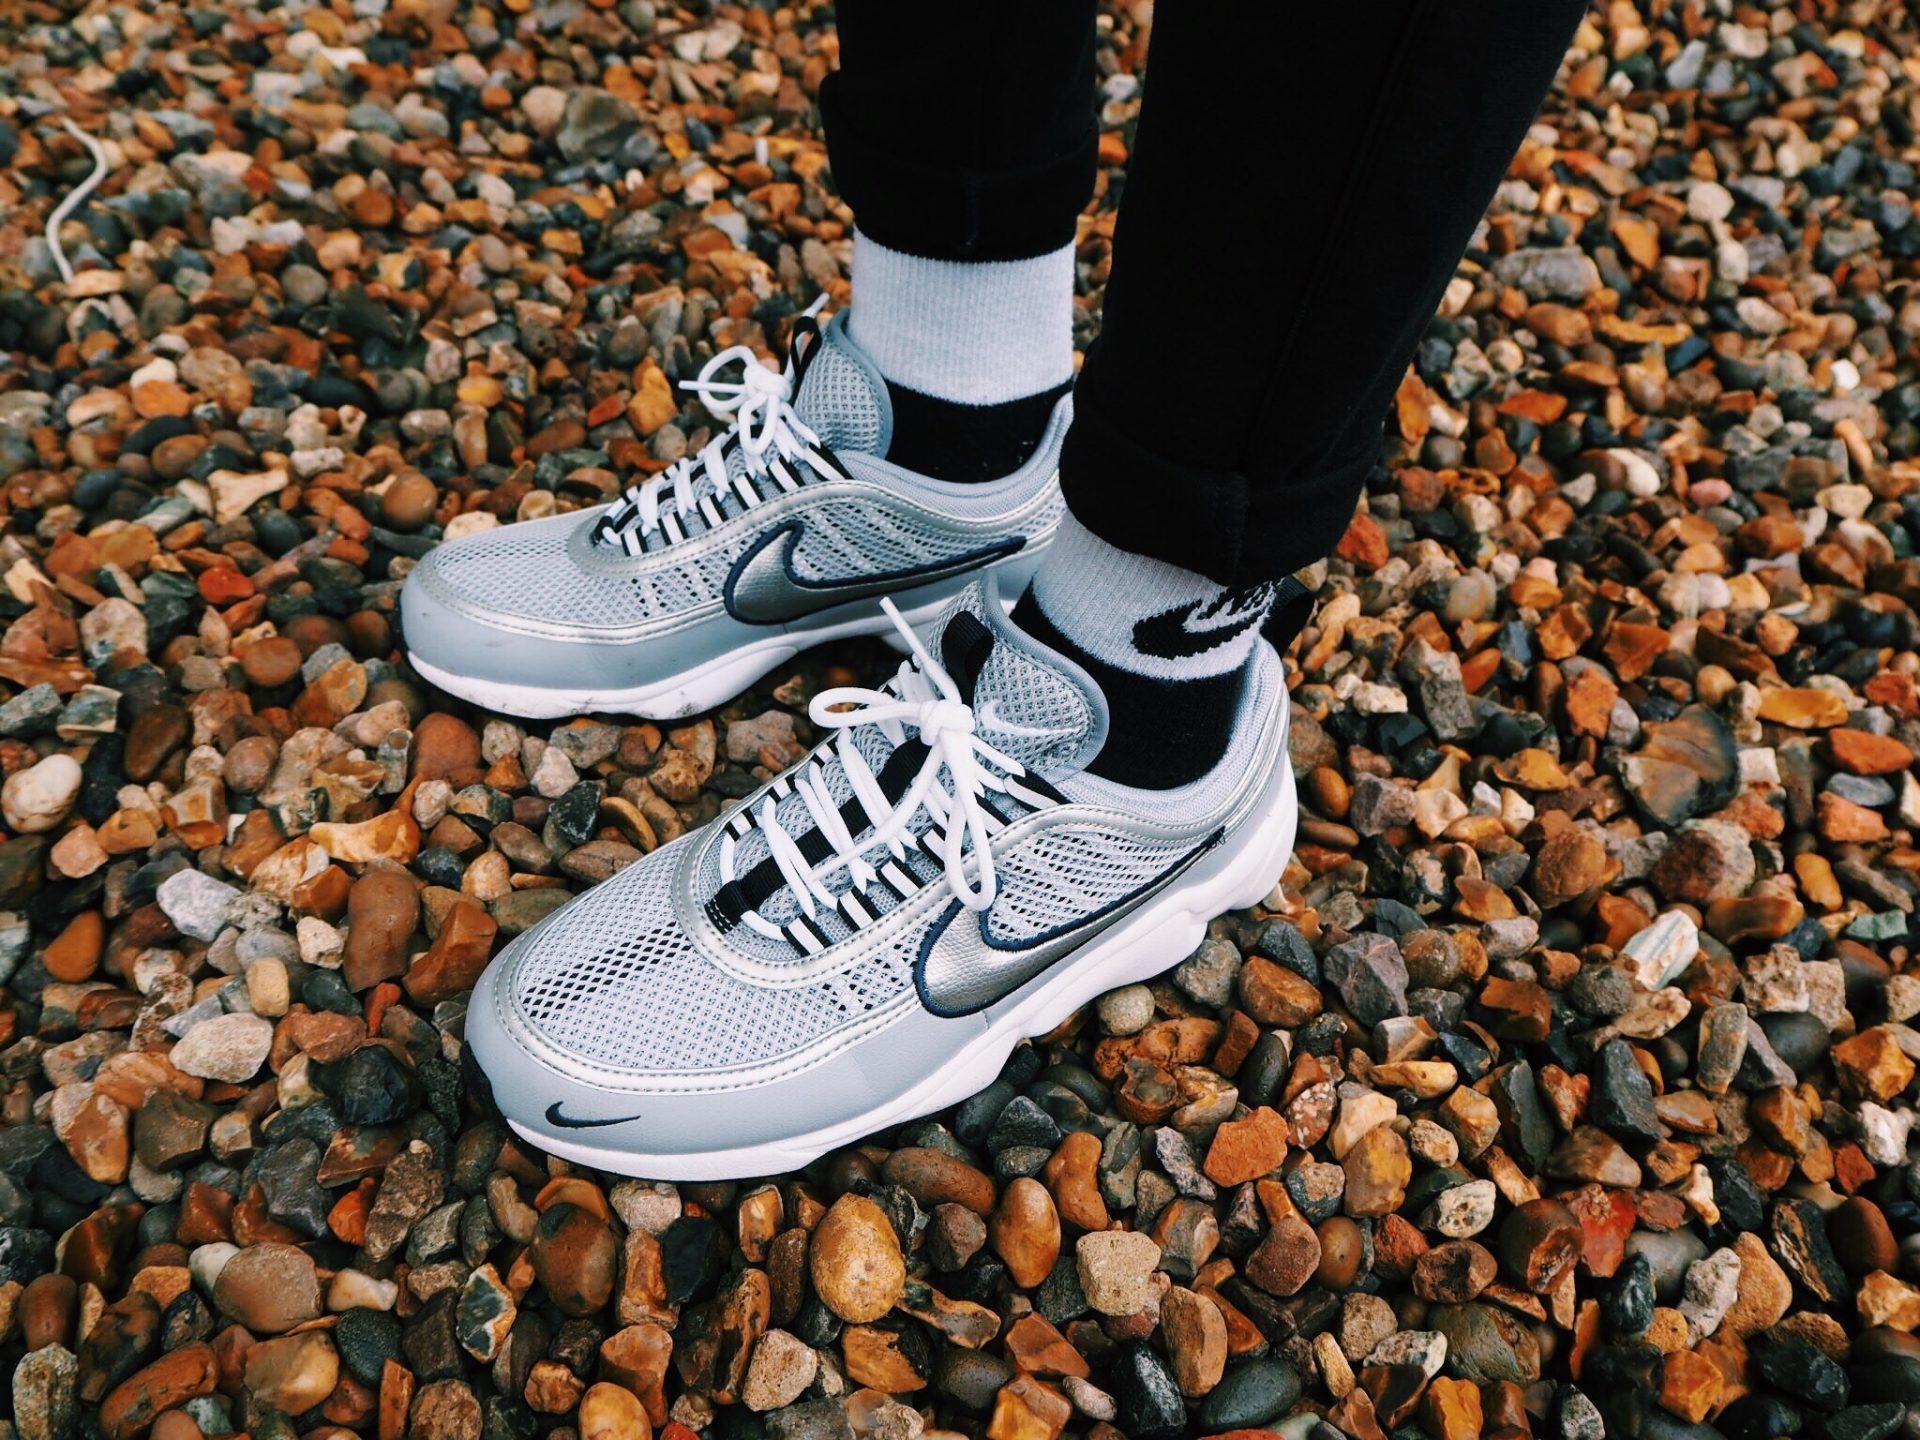 Nike Spiridon Ultra Women's\ufeff - Kitty Cowell